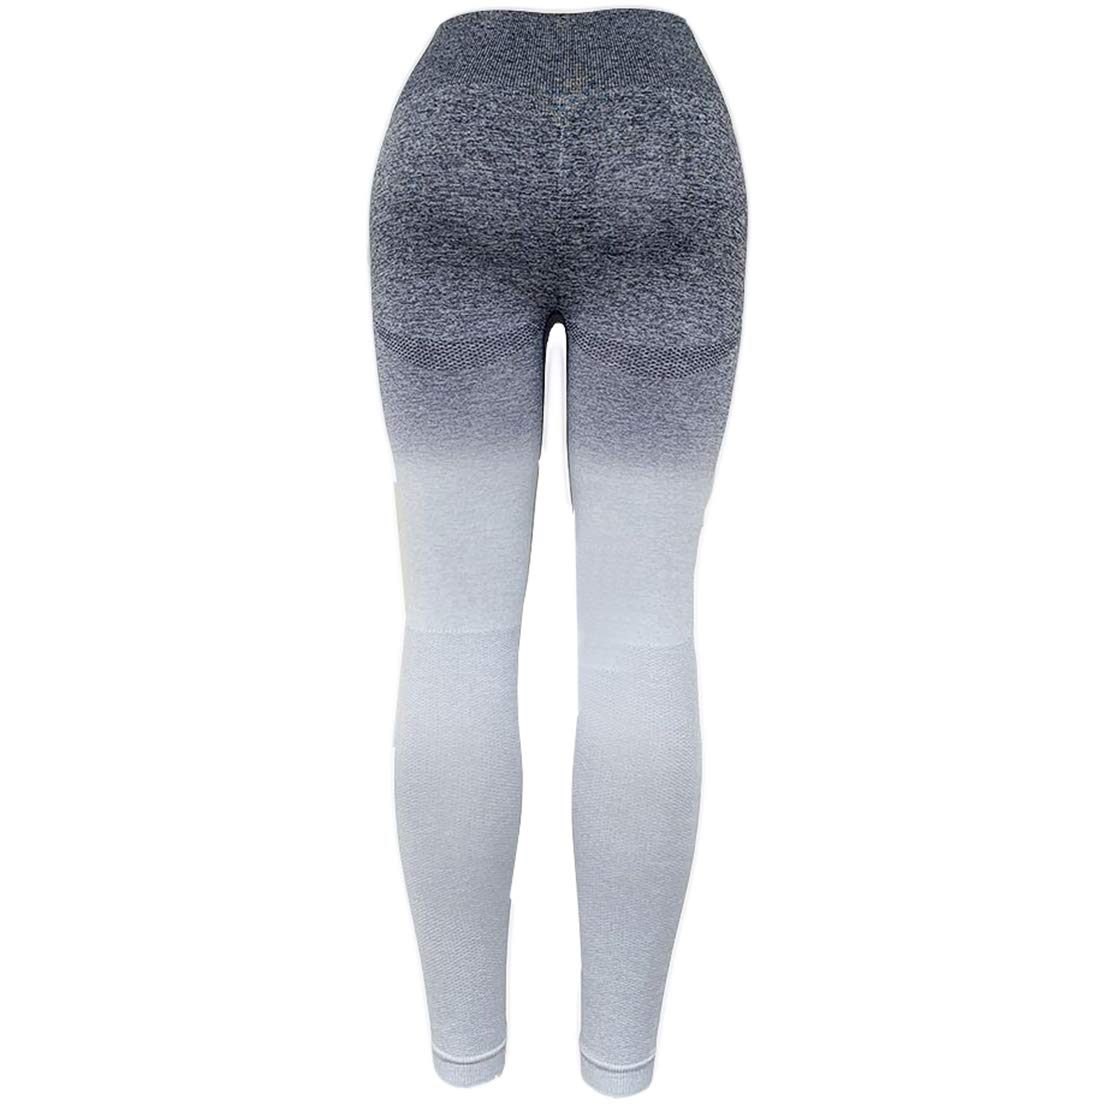 Gaga city Leggins Fitness Mujer Cintura Alta Pantalones Deporte Yoga Gym Leggins Seamless Workout Compression Leggings